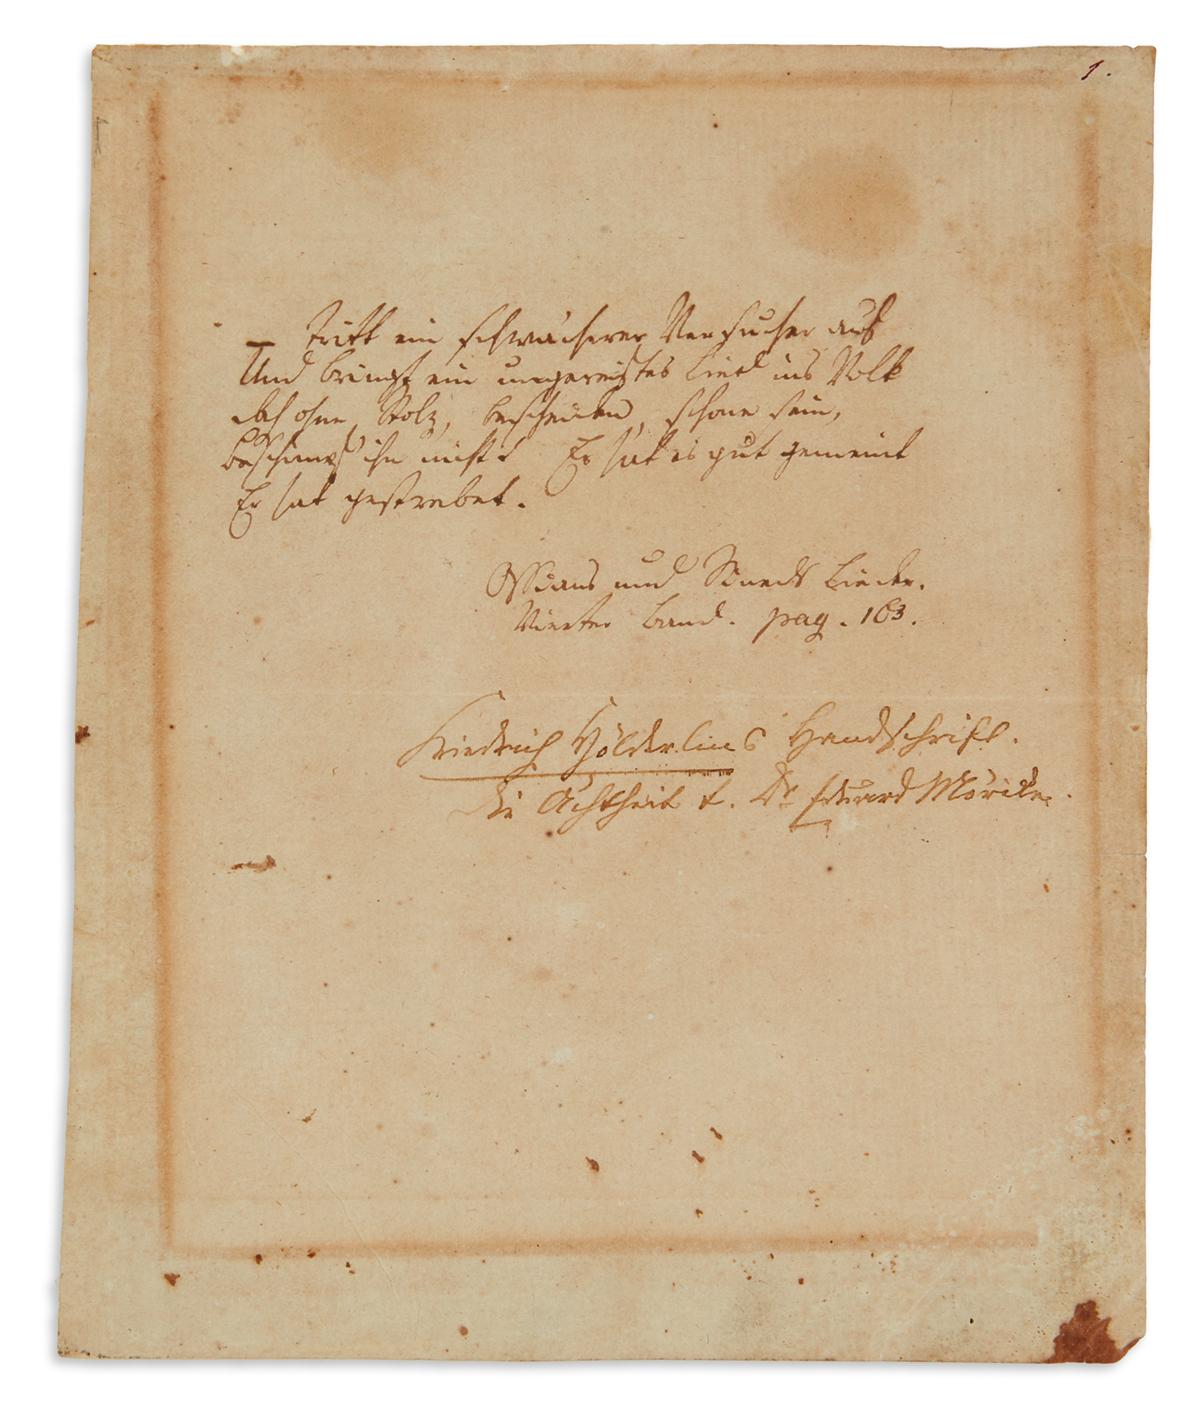 HÖLDERLIN, FRIEDRICH. Autograph Manuscript, unsigned, 7 lines quoting a stanza from Michael Deniss Ossians und Sineds Lieder, in Germa